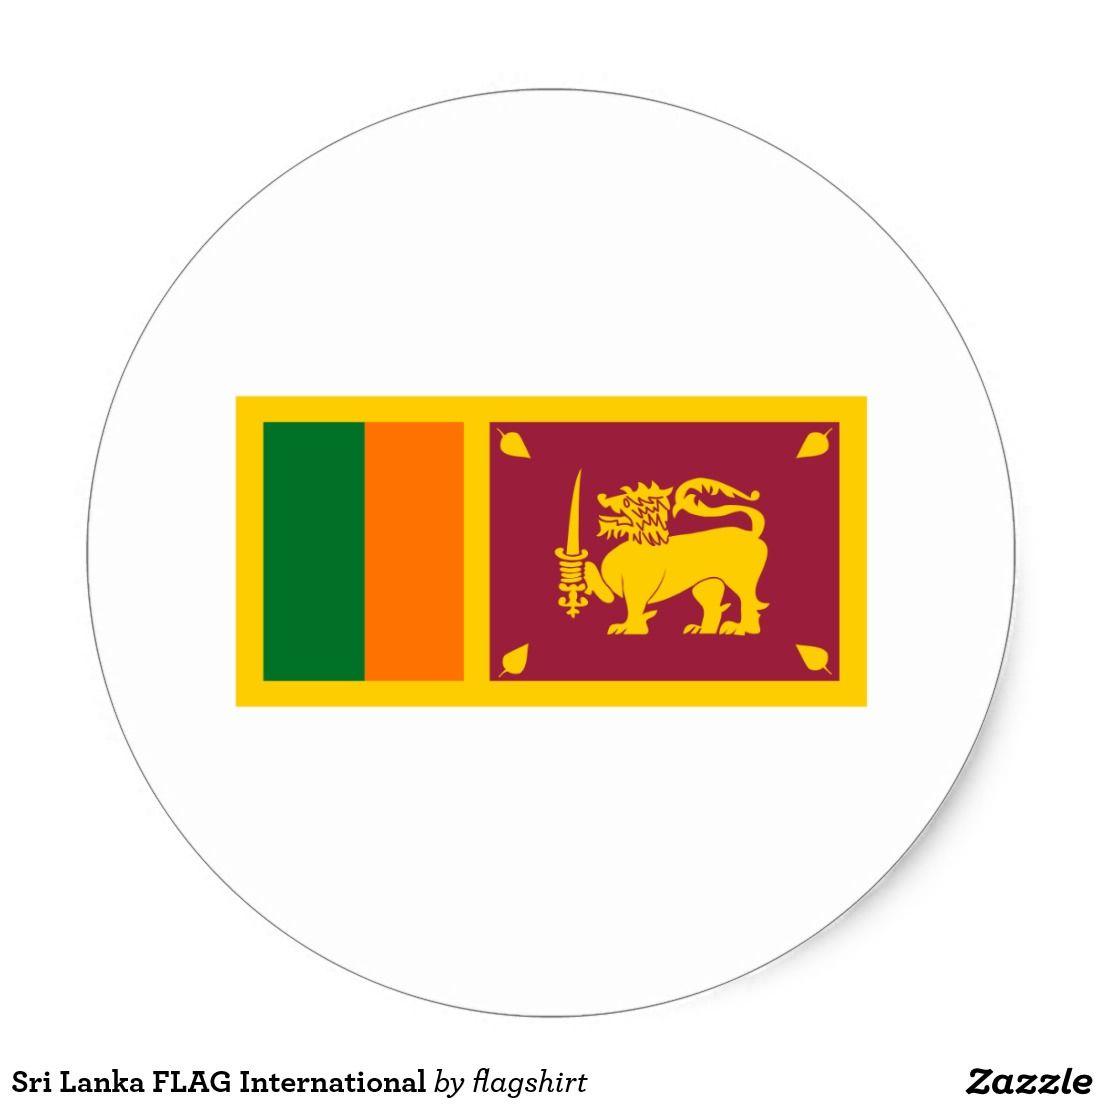 Sri Lanka Flag International Classic Round Sticker Zazzle Com Sri Lanka Flag Sri Lanka Round Stickers